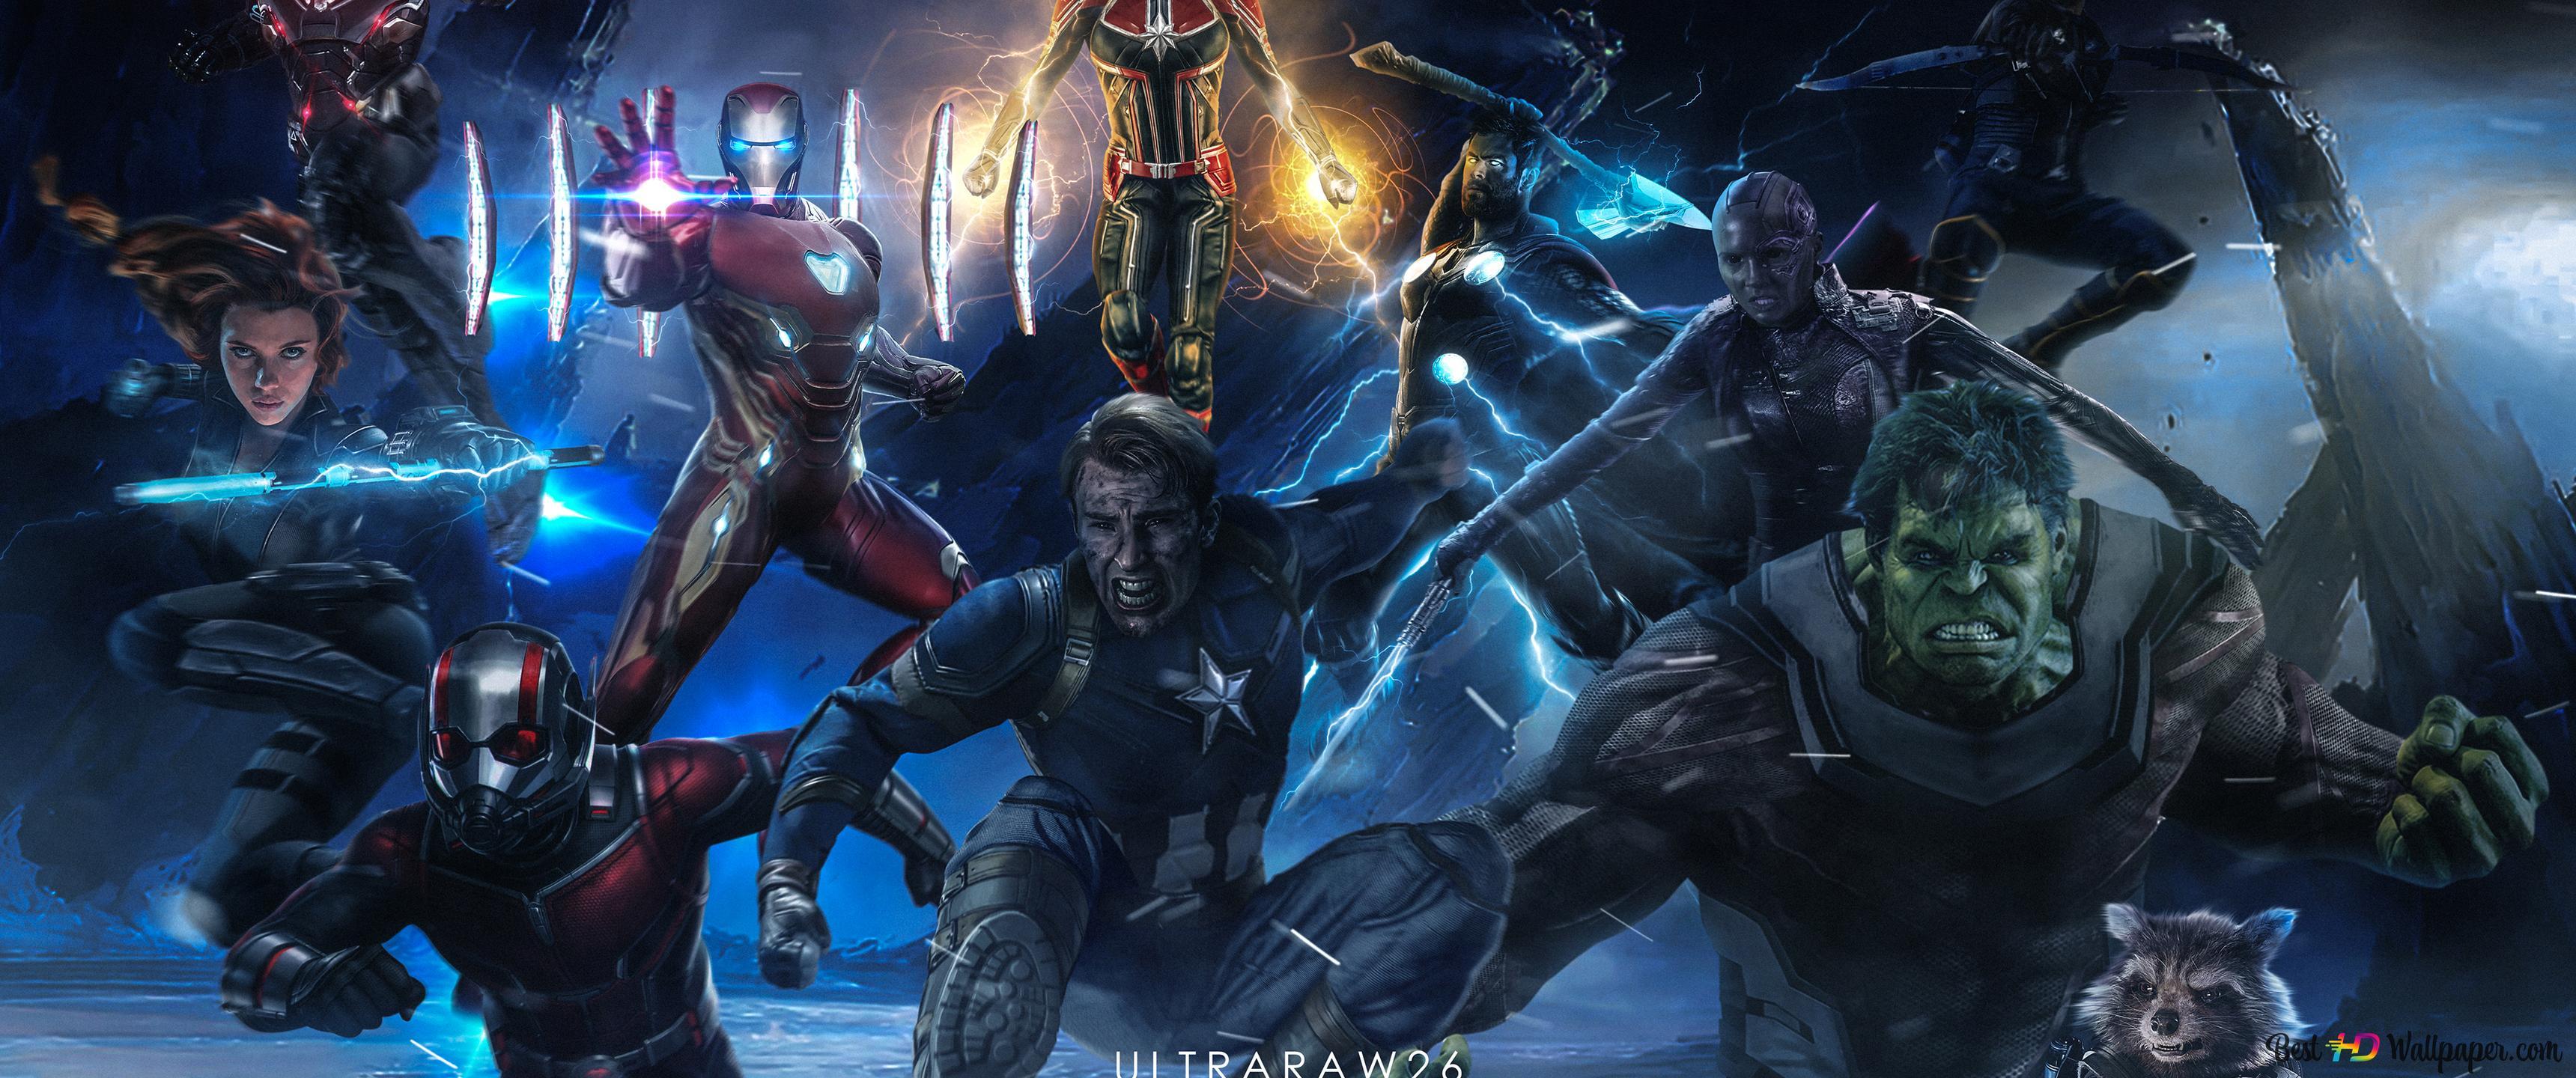 Avengers endgame par ultraraw26 hd fond d 39 cran t l charger - Telecharger avengers ...